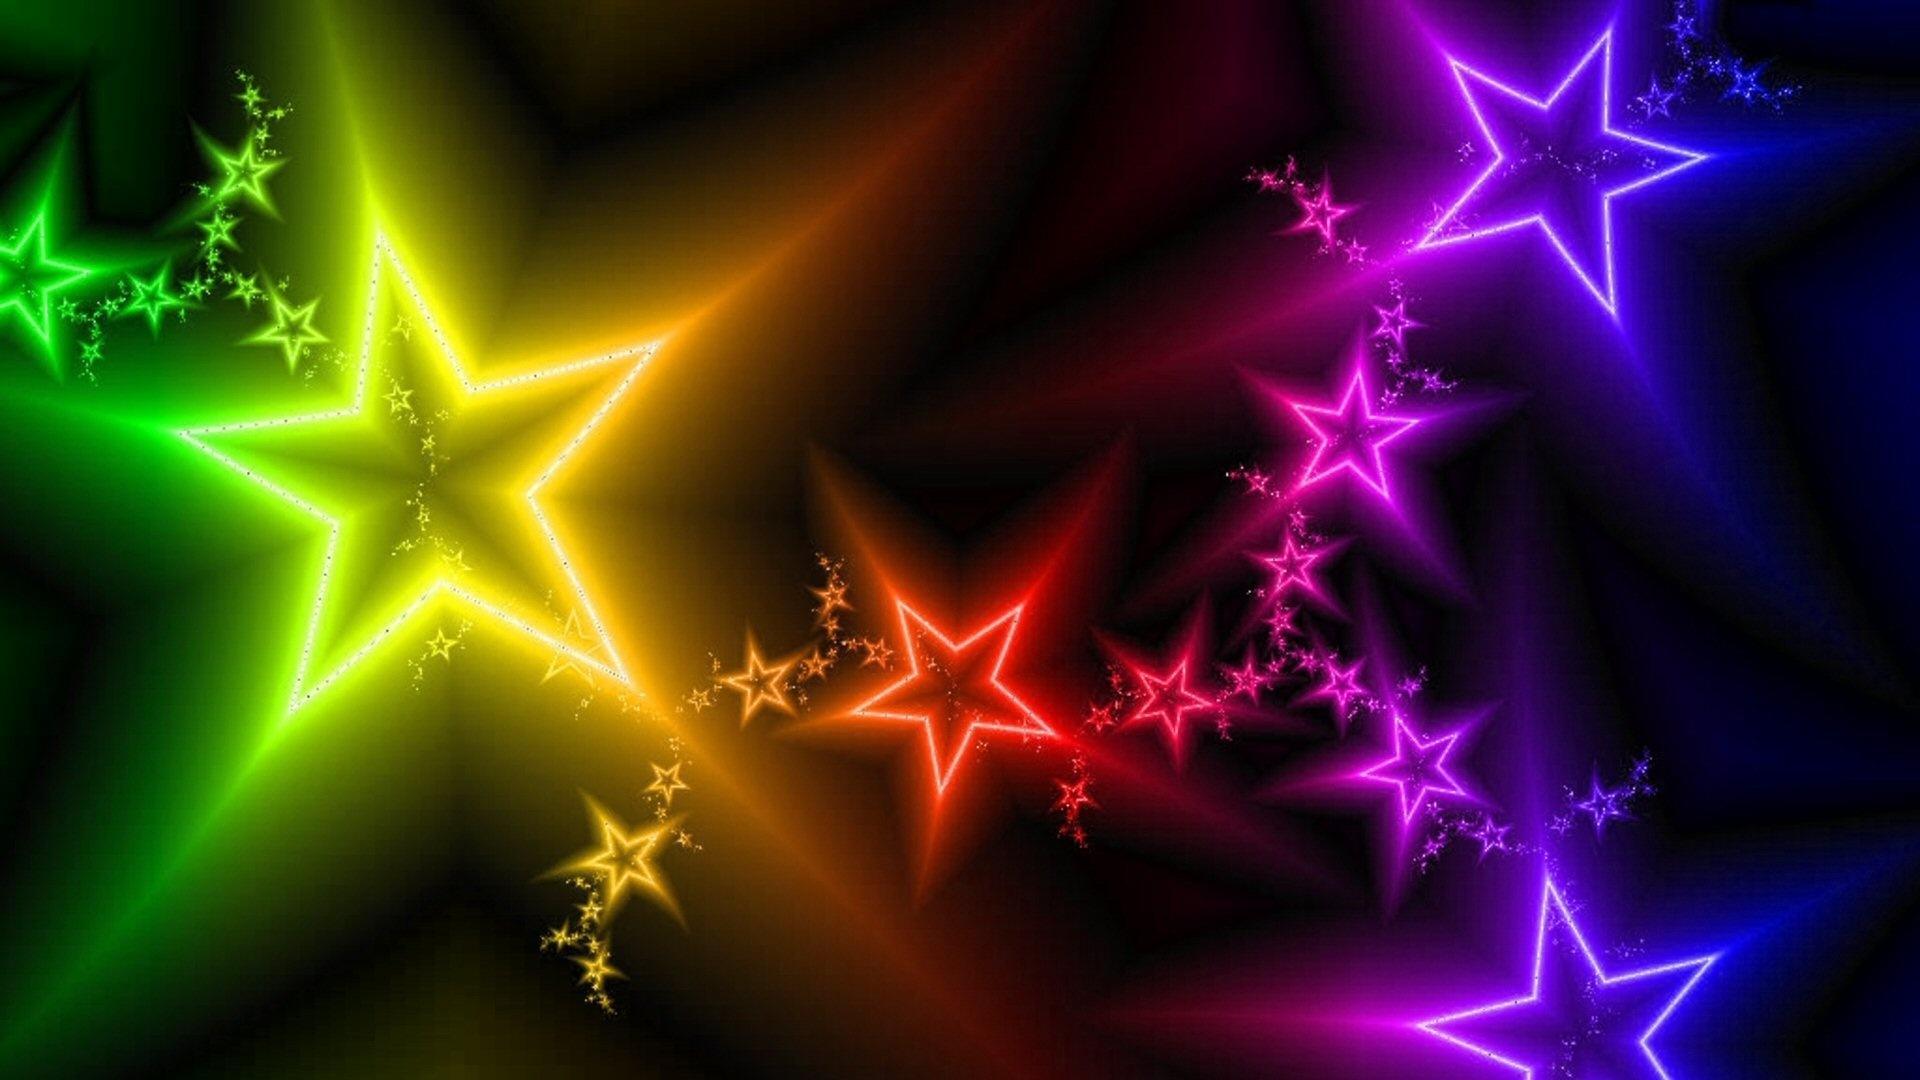 Stars Wallpapers, wallpaper, Colorful Stars Wallpapers hd wallpaper ...